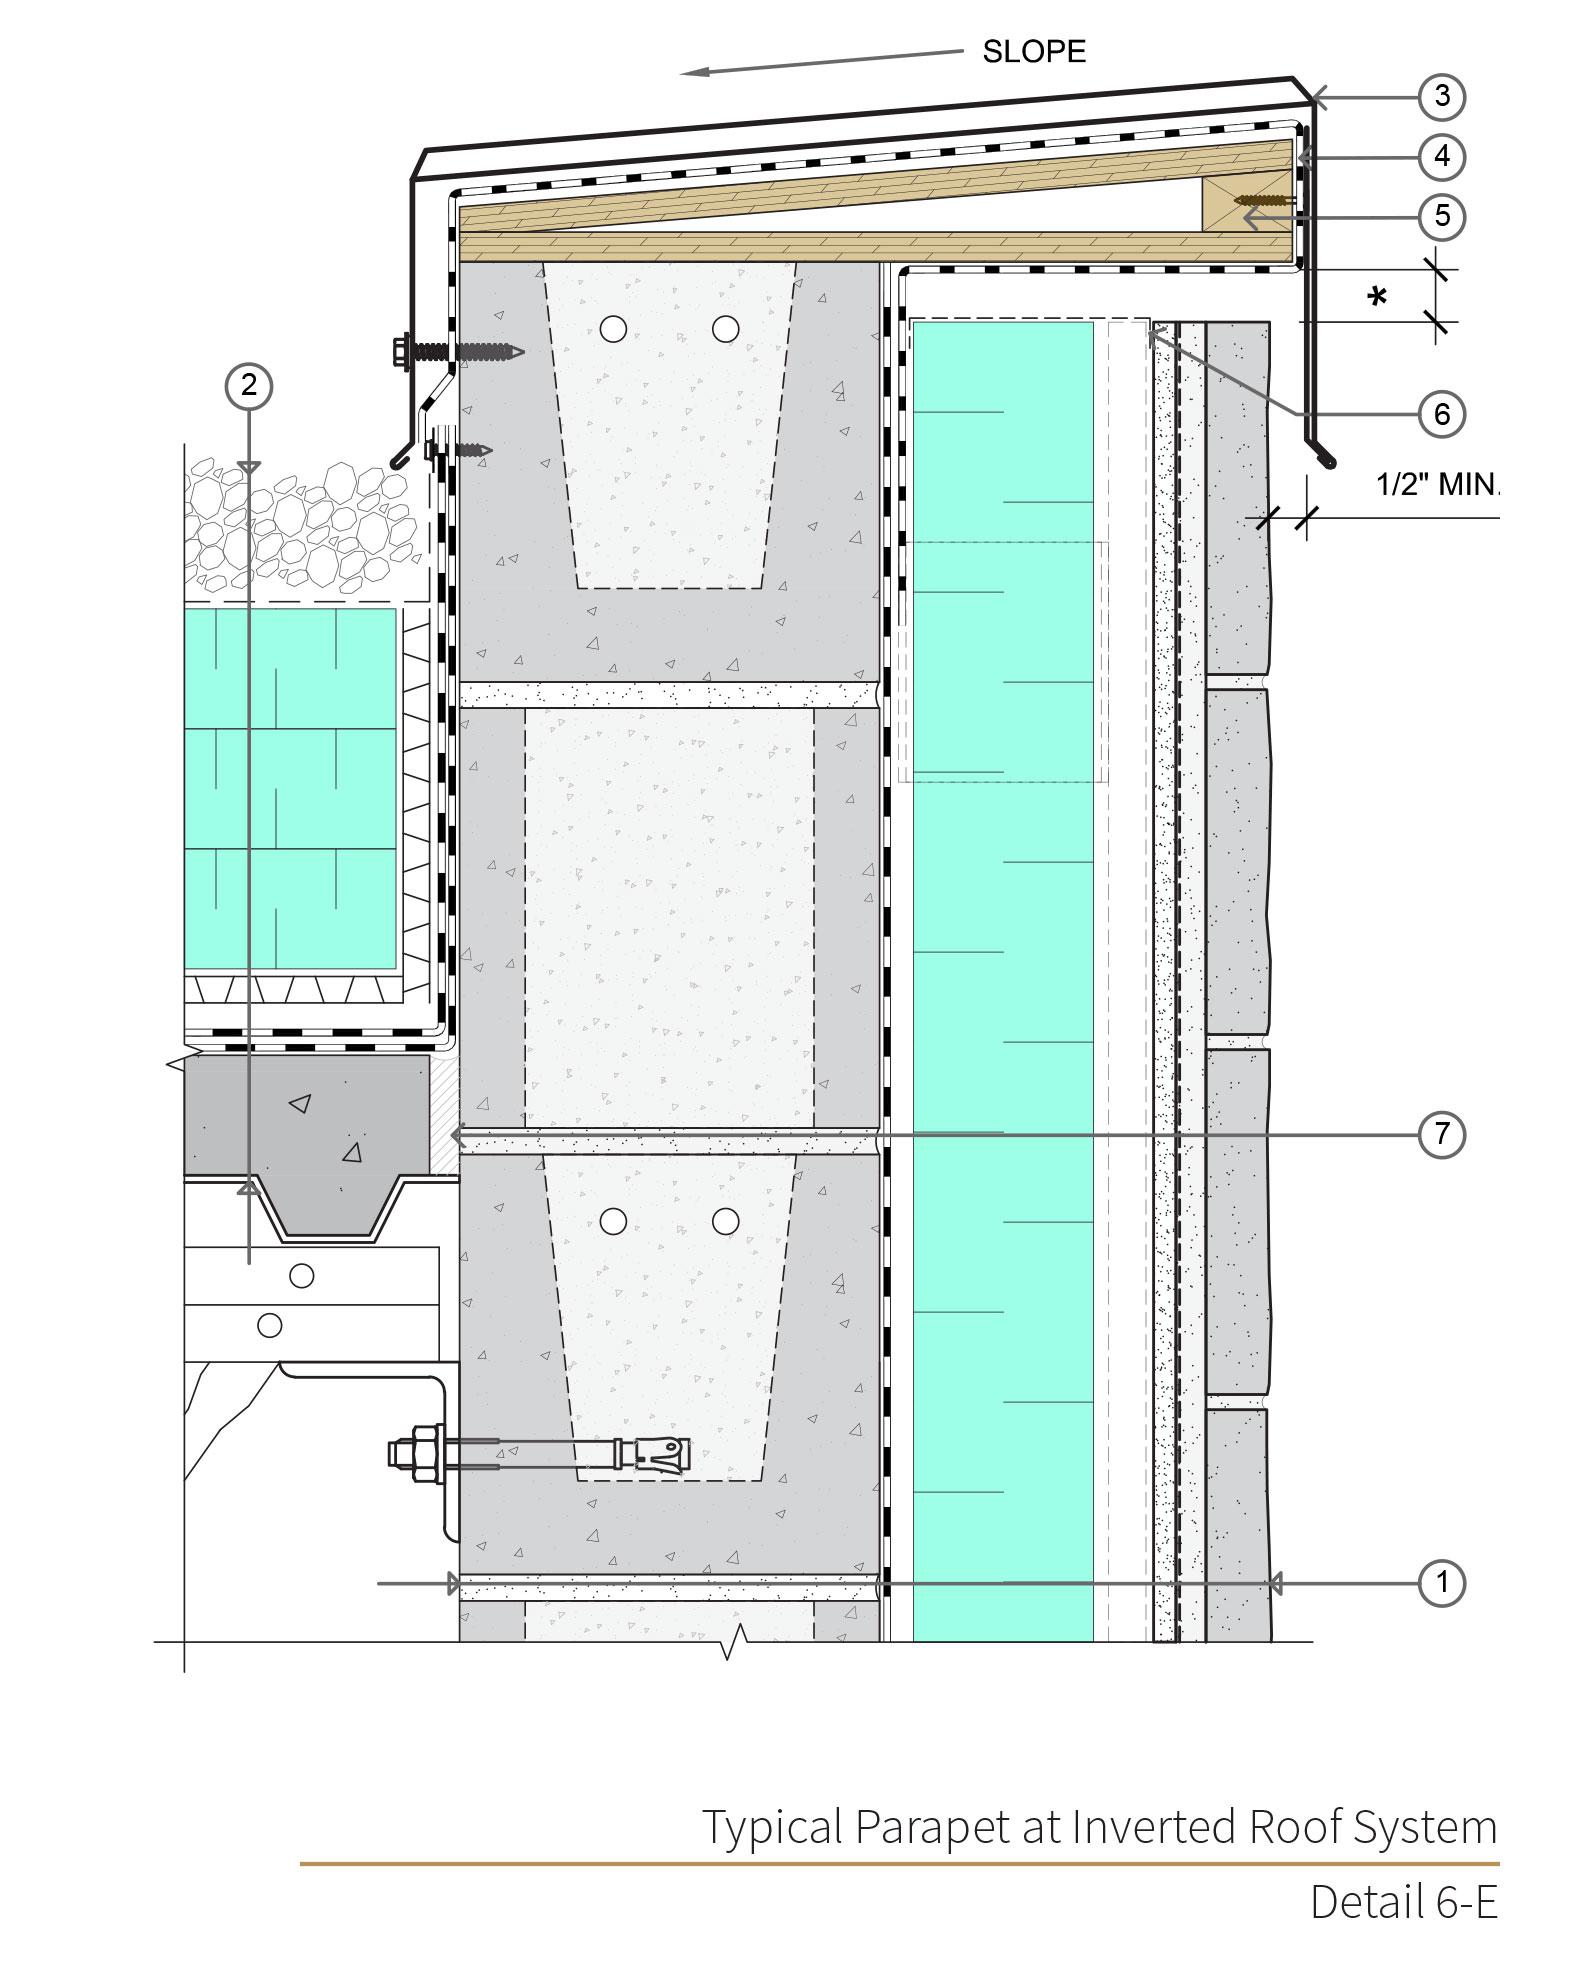 Assembly 6 Detail 6E